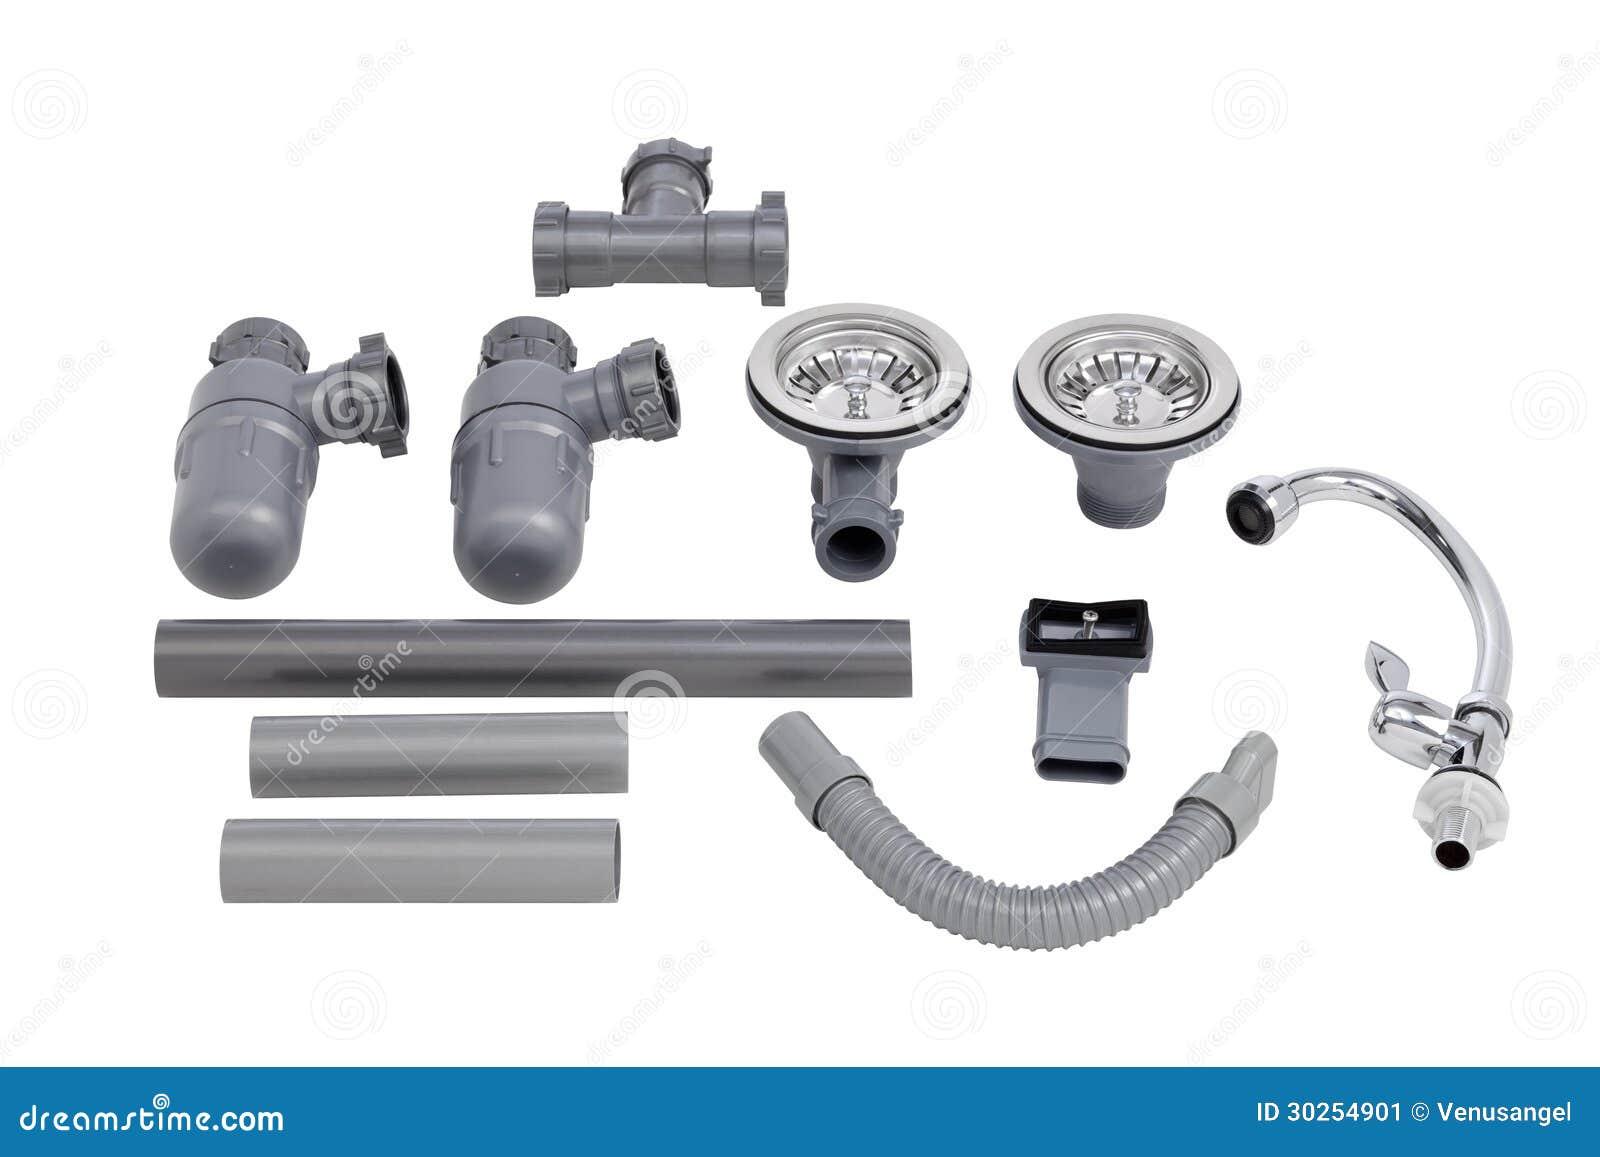 Kitchen Sink Accessories the accessories of kitchen sink stock image - image: 30254901